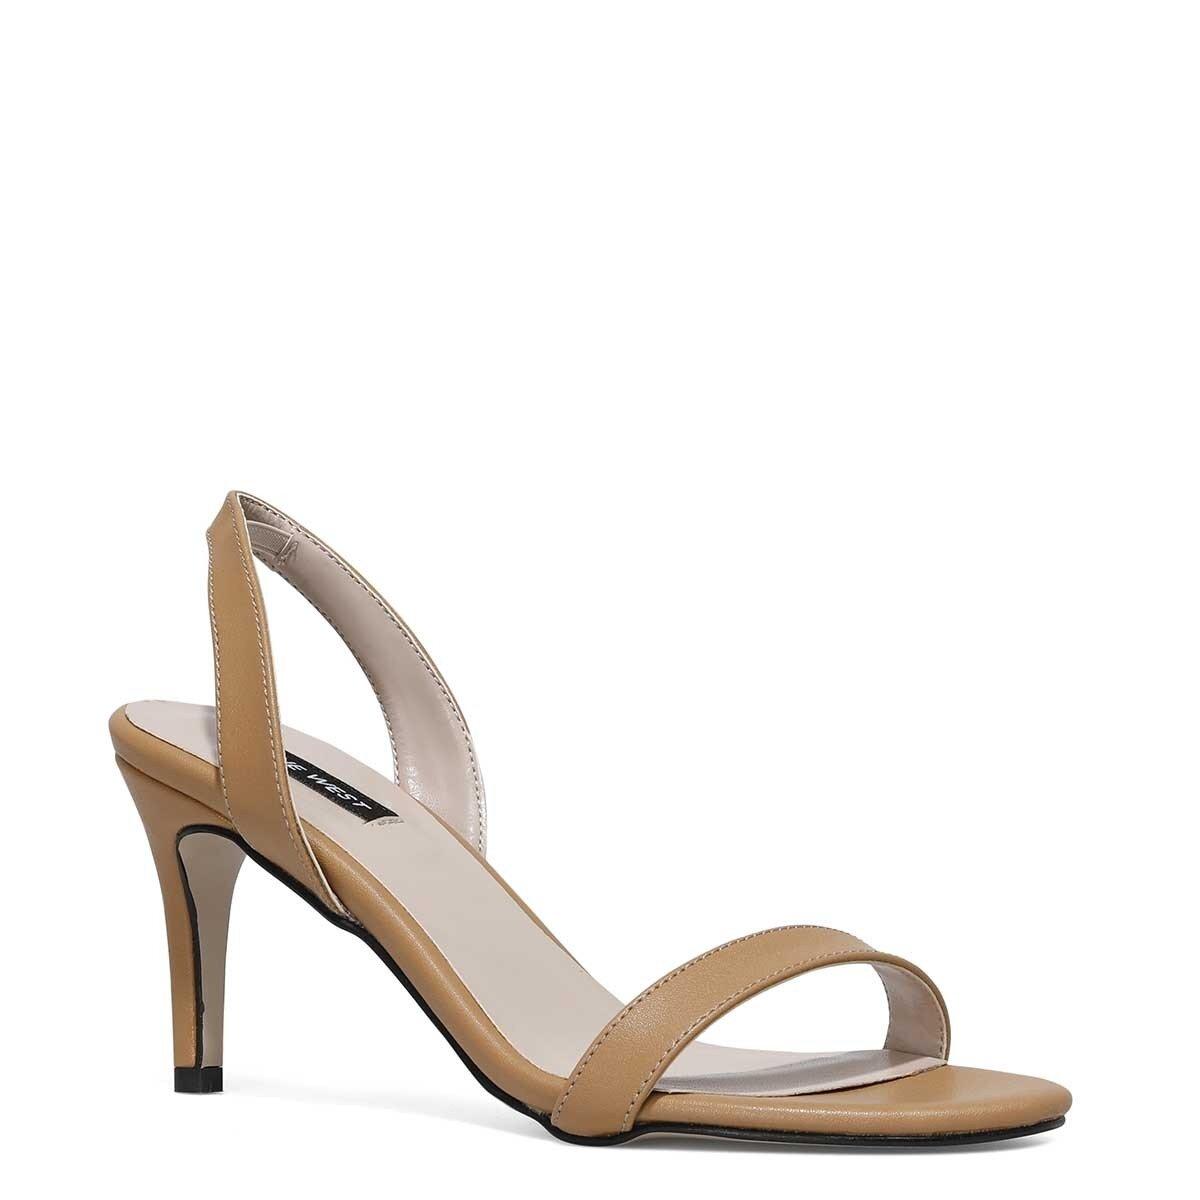 PUNAMI 1FX Taba Kadın Topuklu Sandalet